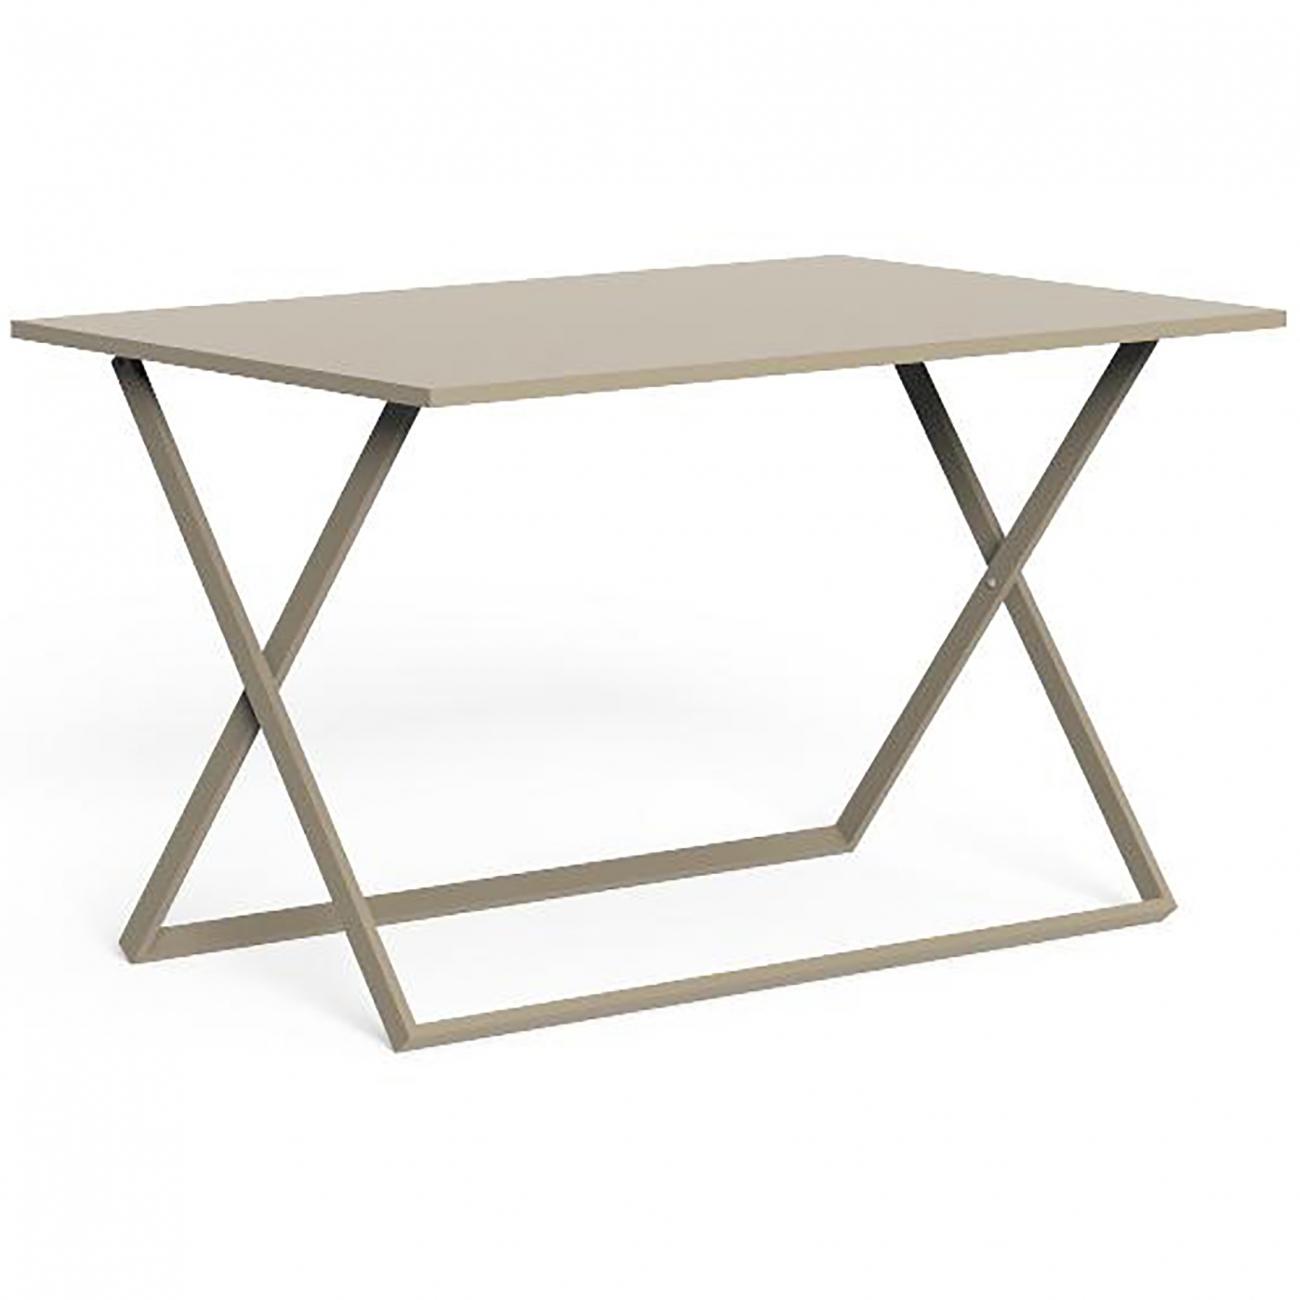 Talenti Queen folding table